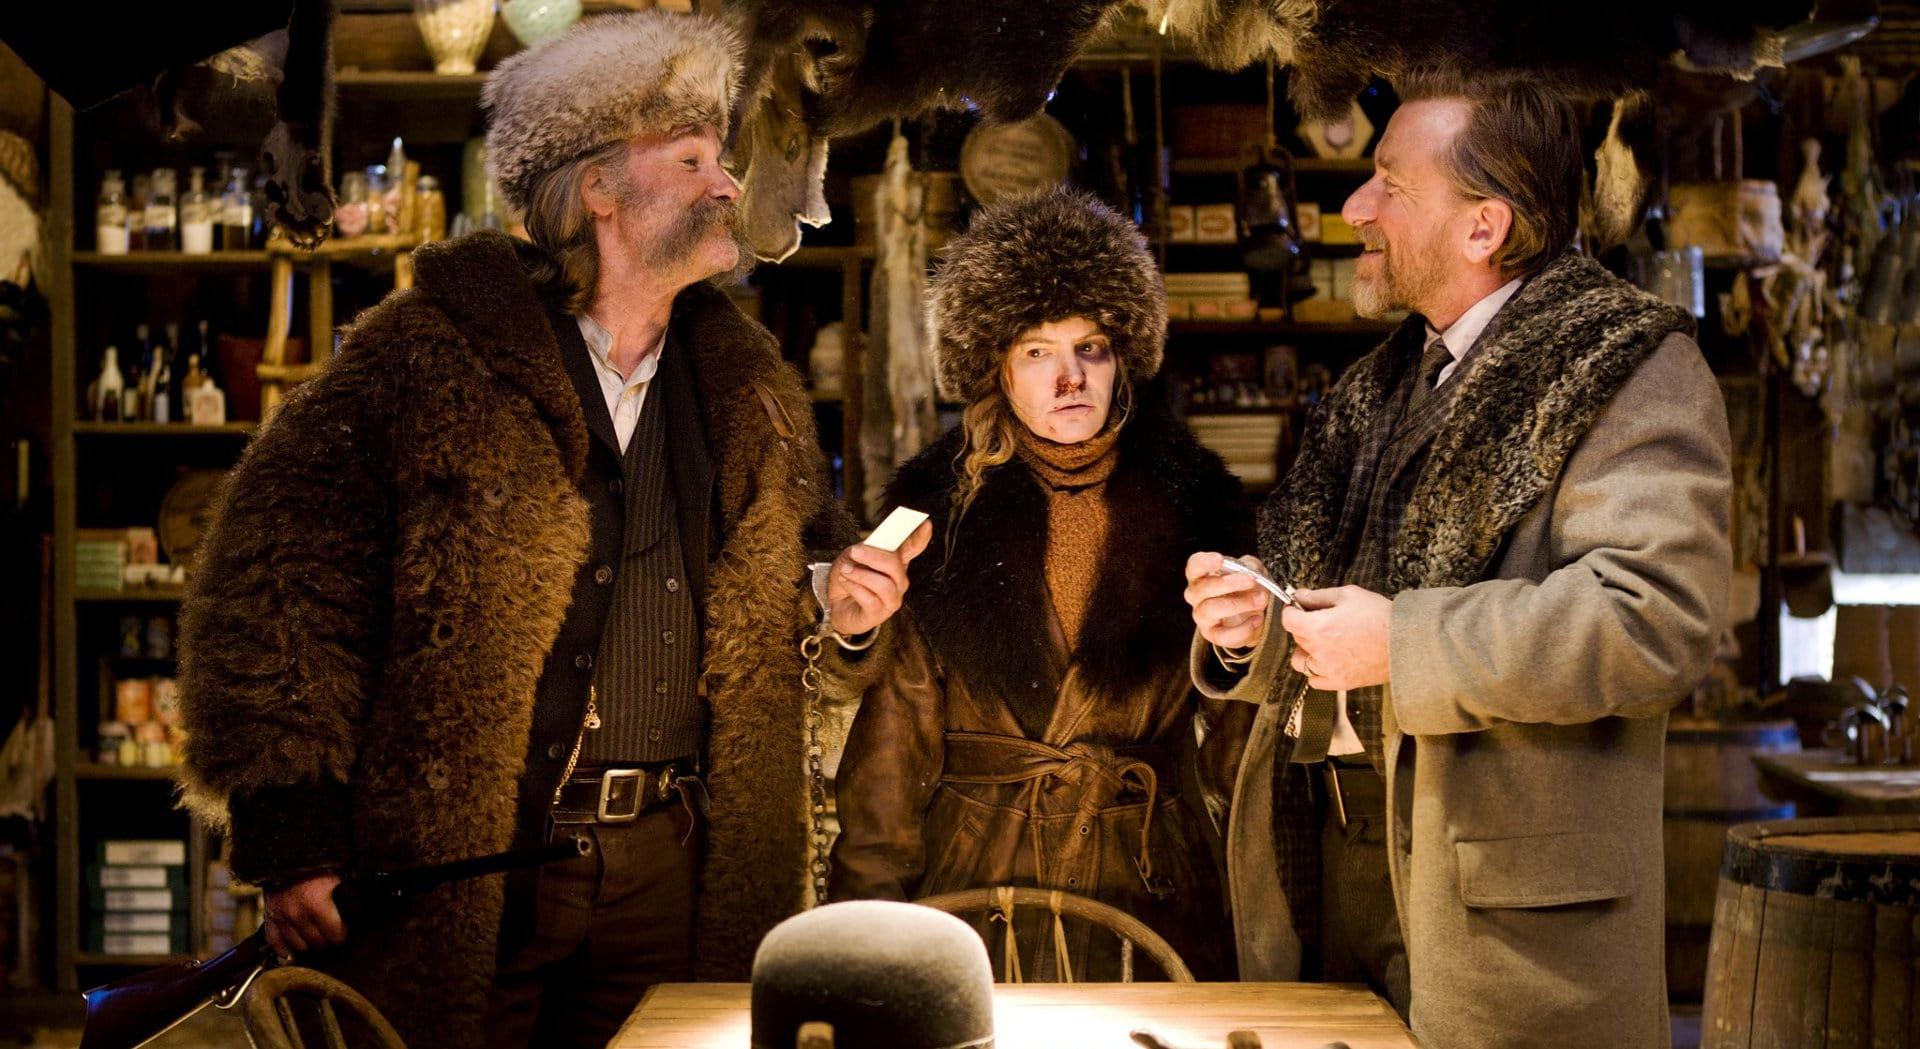 Kurt Russell, Tim Roth et Jennifer Jason Leigh dans le saloon des Huit Salopards